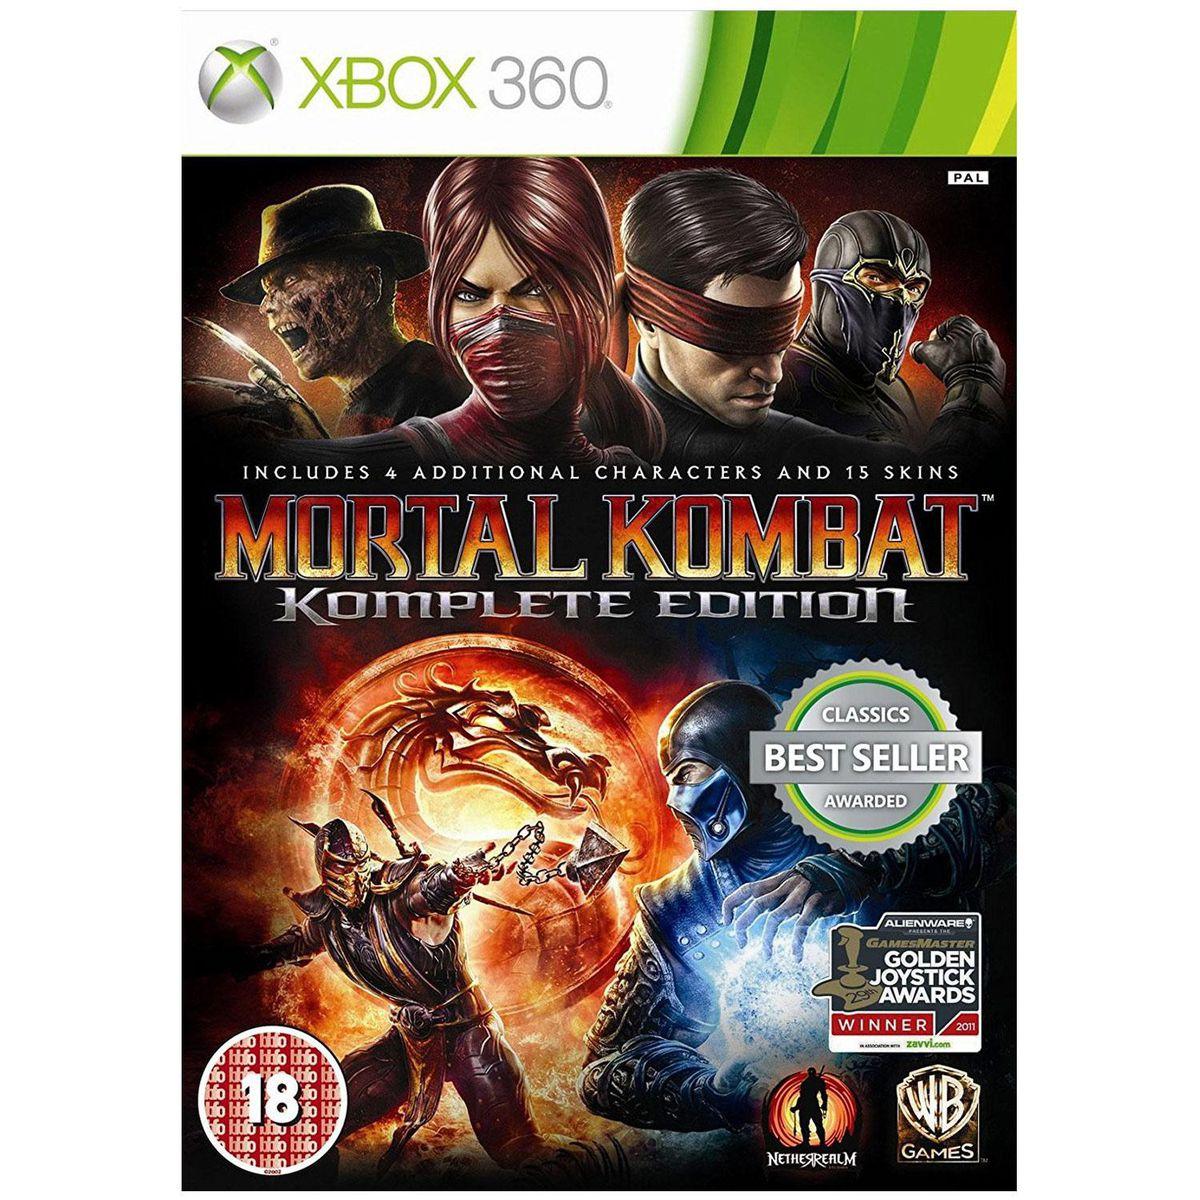 Mortal Kombat Timeline - IMDb